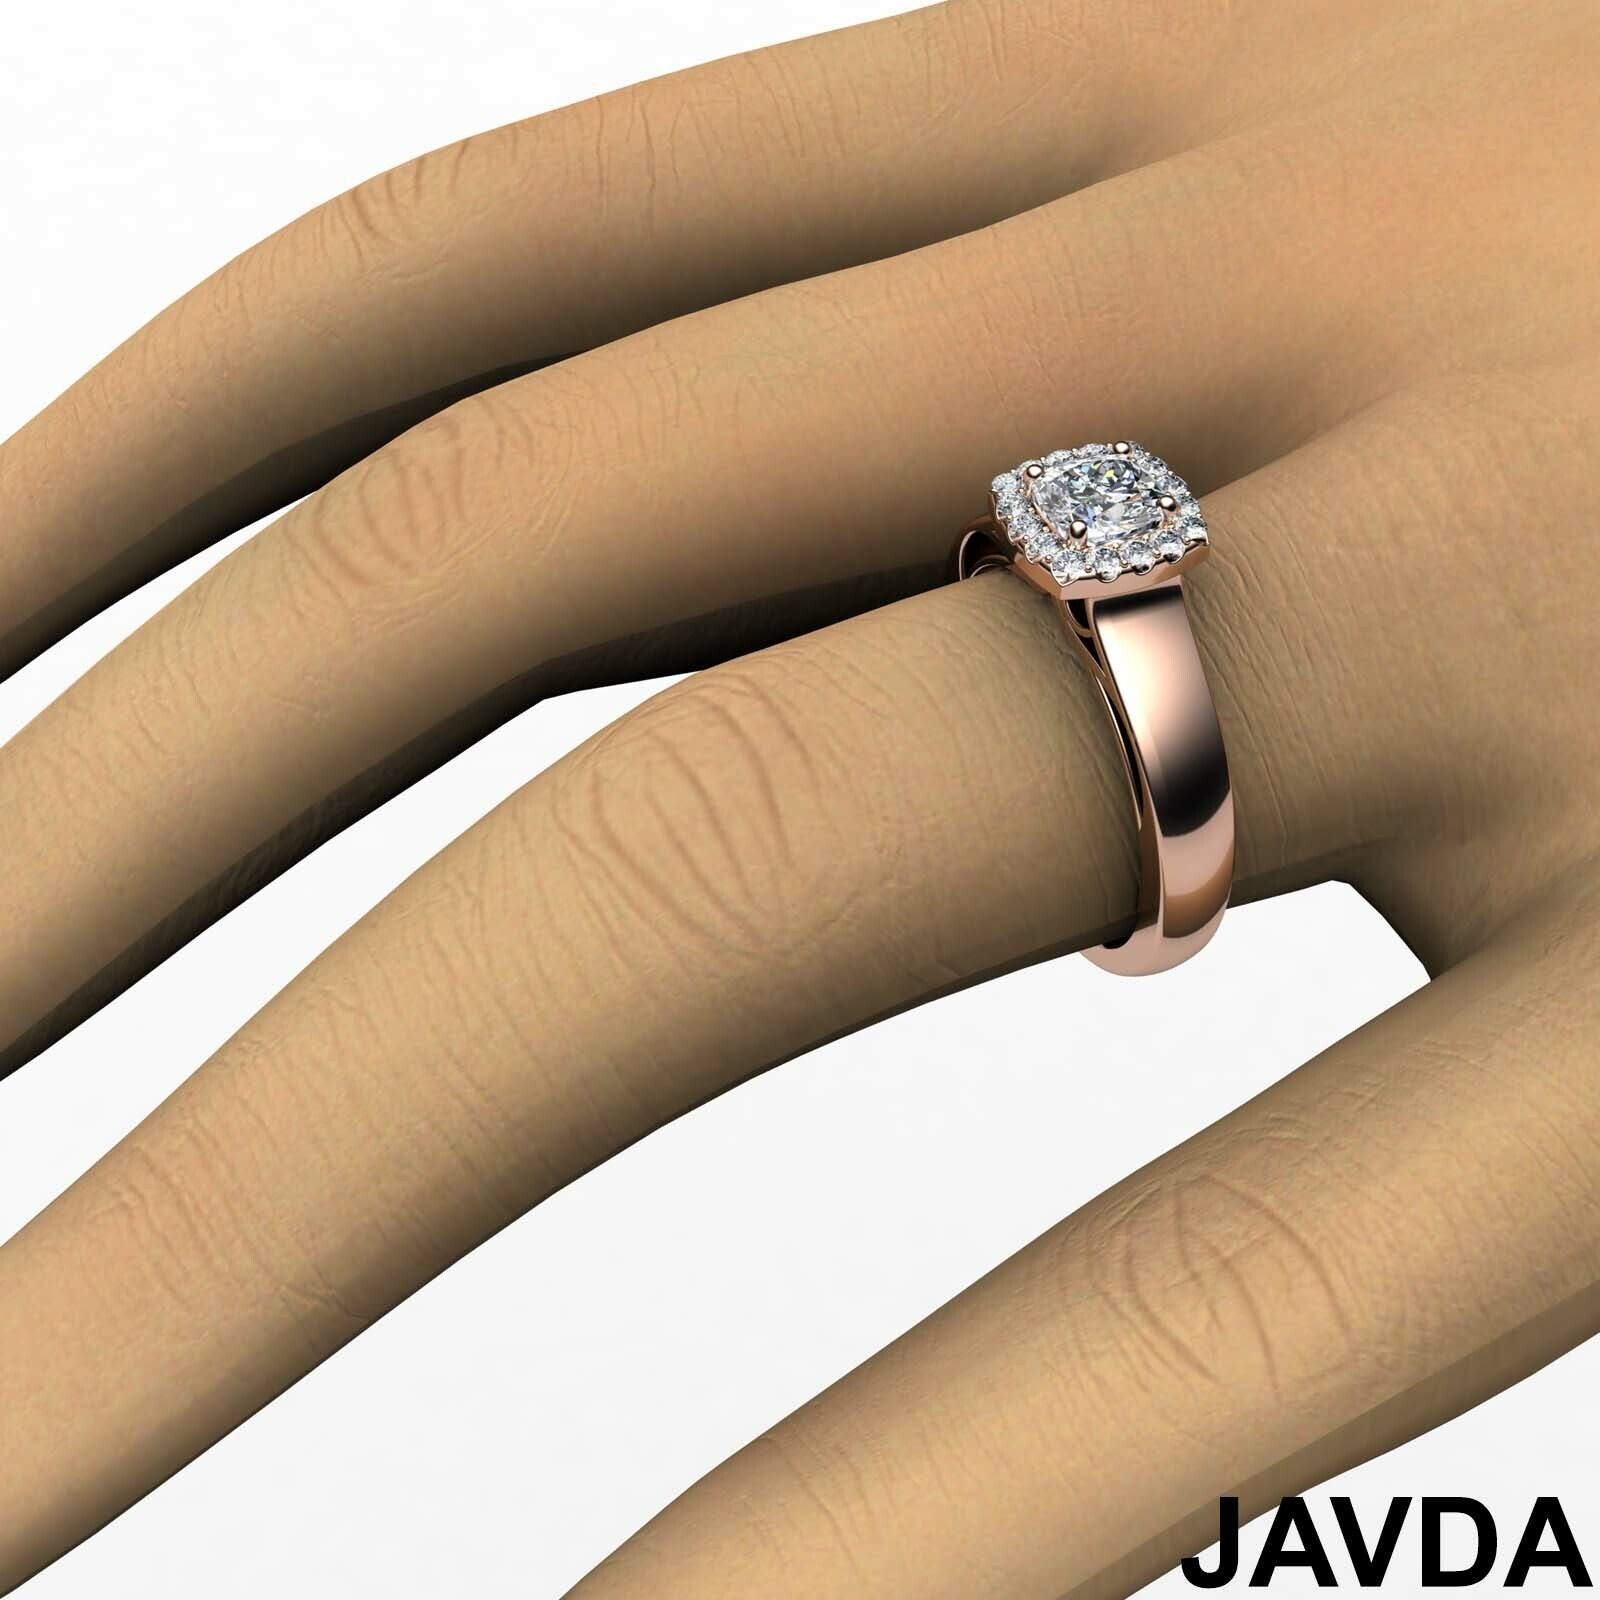 Filigree Shank U Cut Prong Cushion Diamond Engagement GIA H Color VS1 Ring 0.7Ct 11